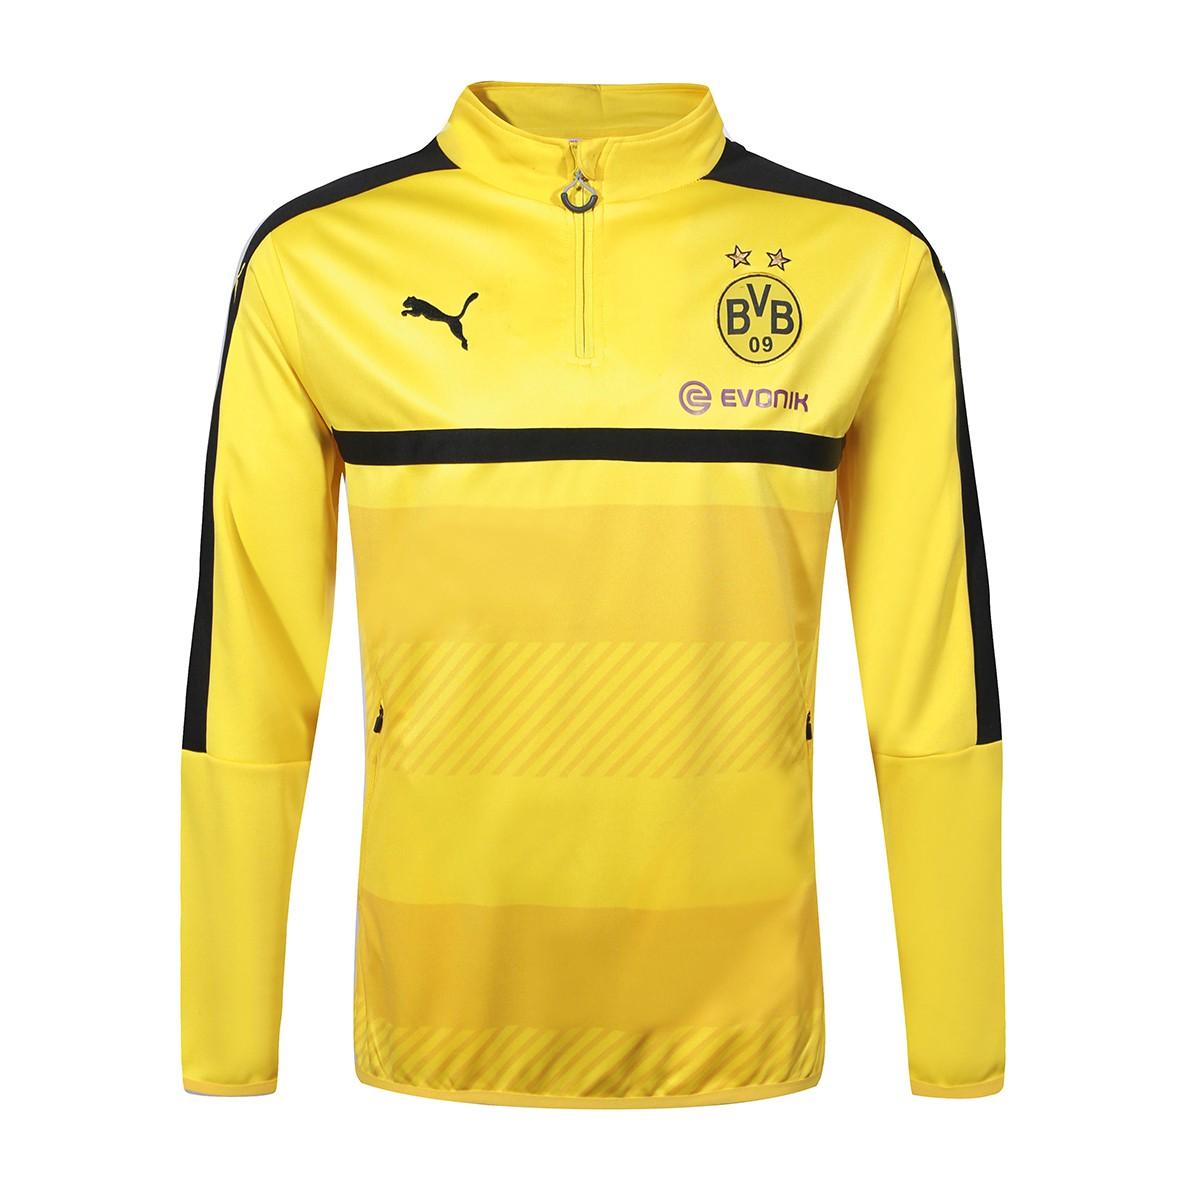 Jersey Kit Dls Borussia Dortmund - Jersey Terlengkap